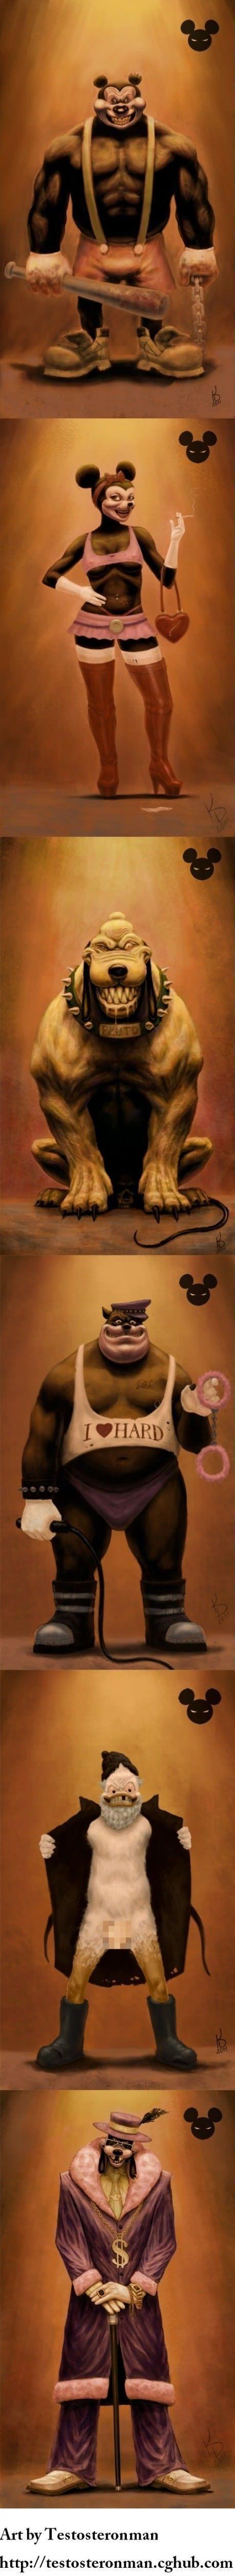 Disney on Steroids